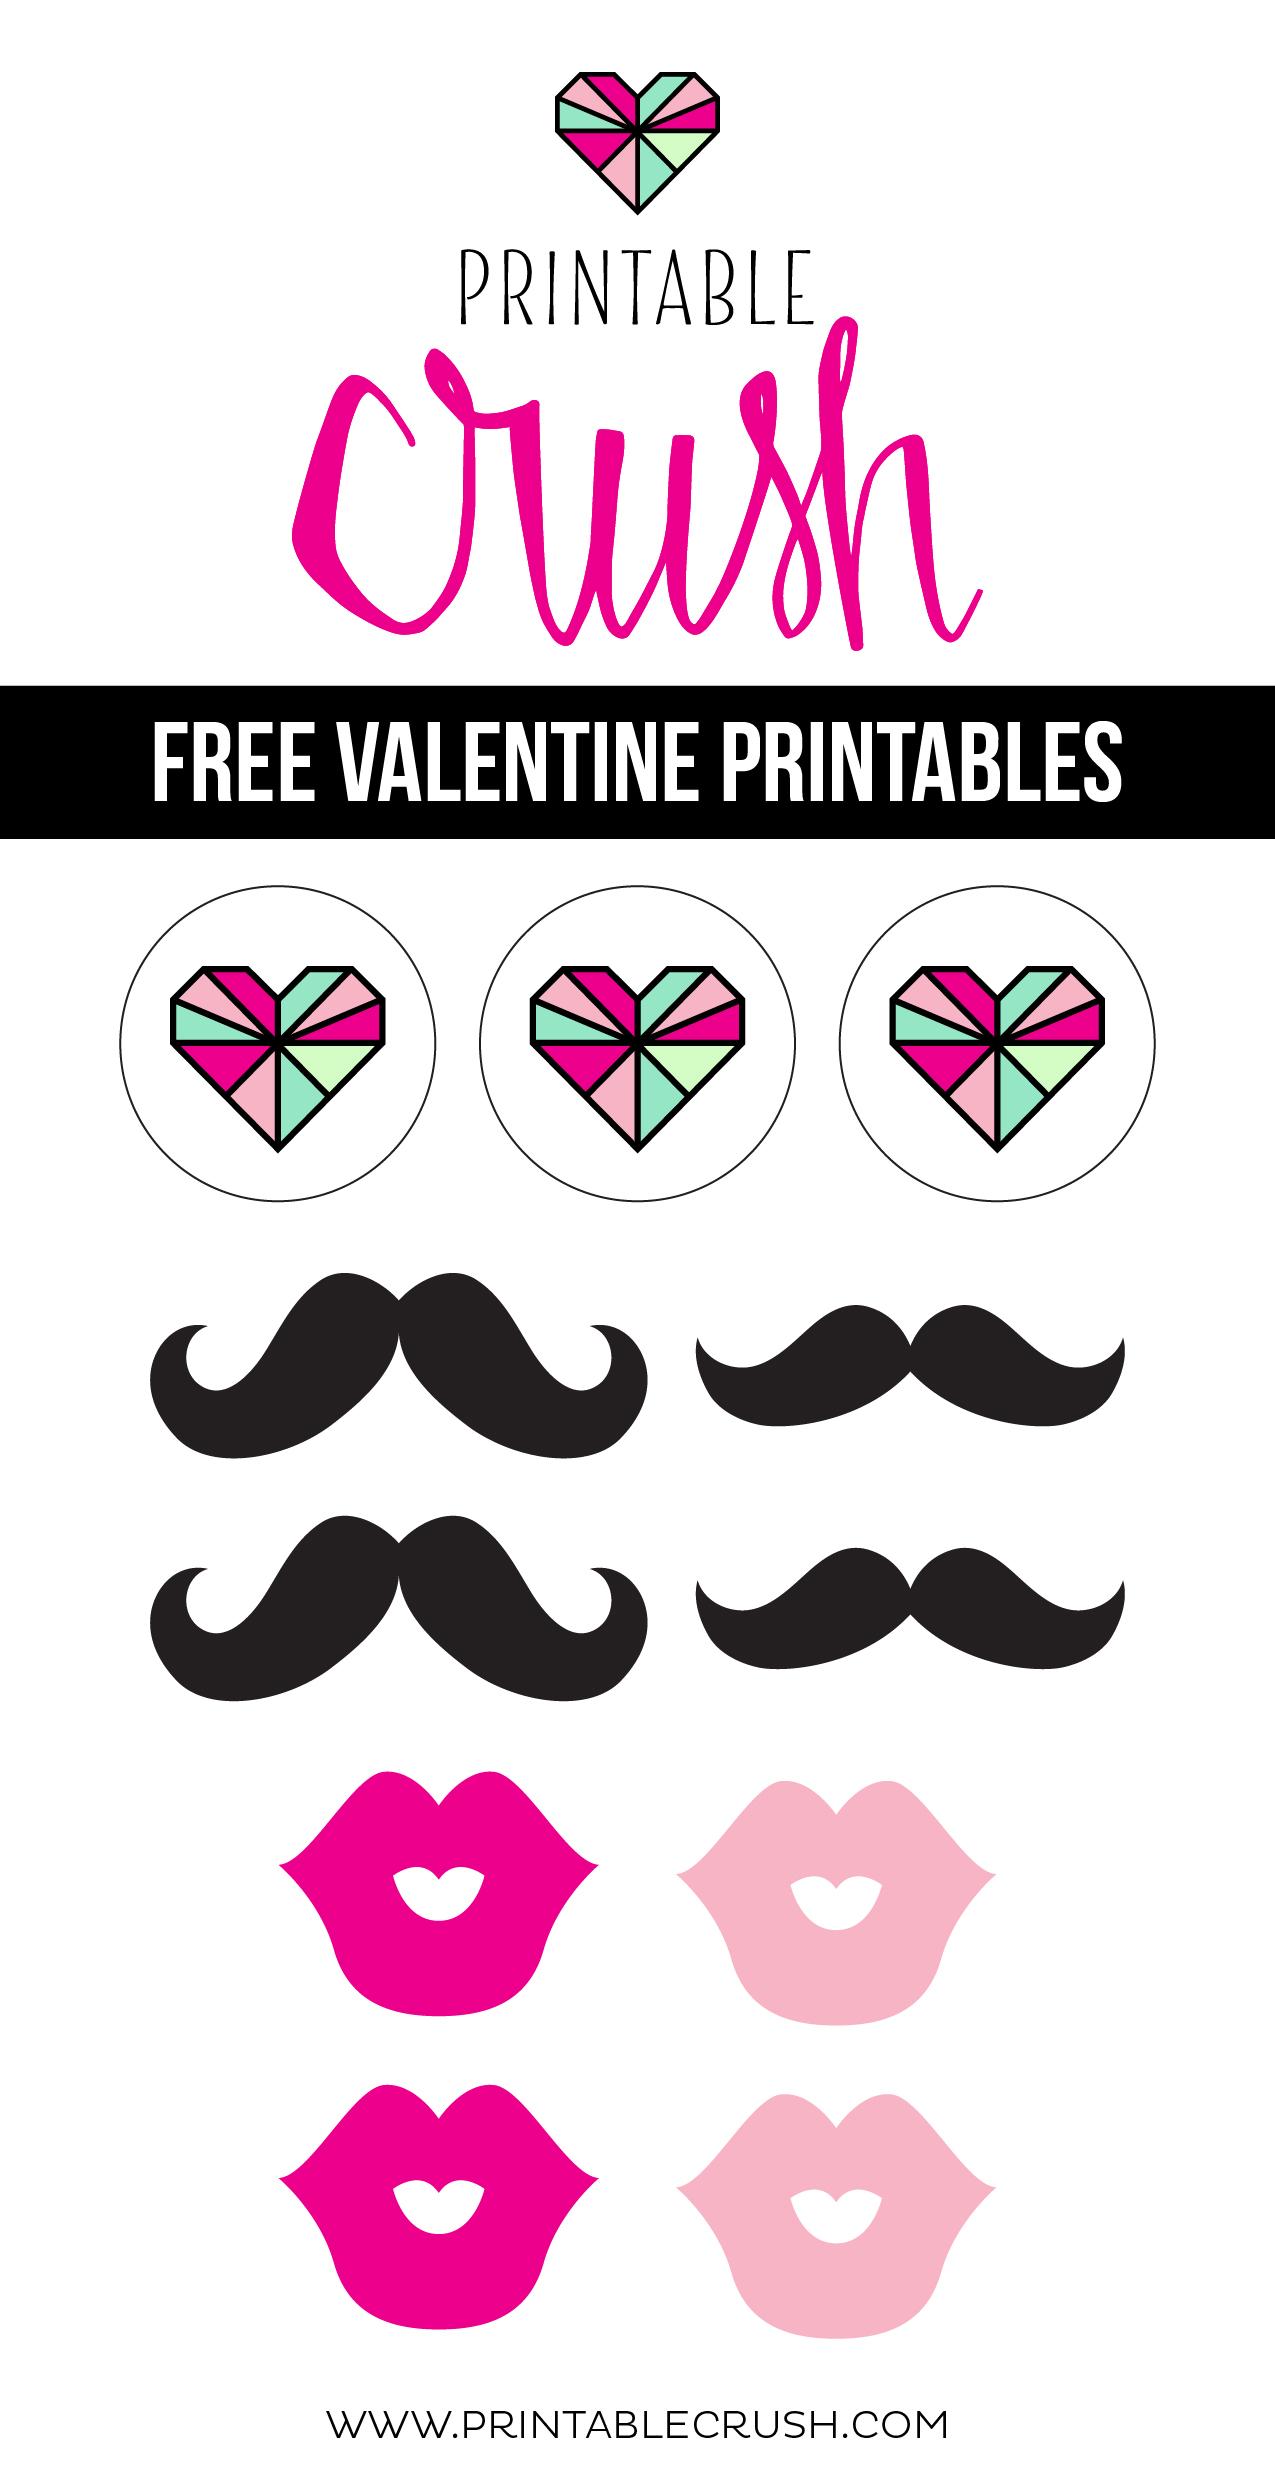 Free Valentine Printables From Printable Crush